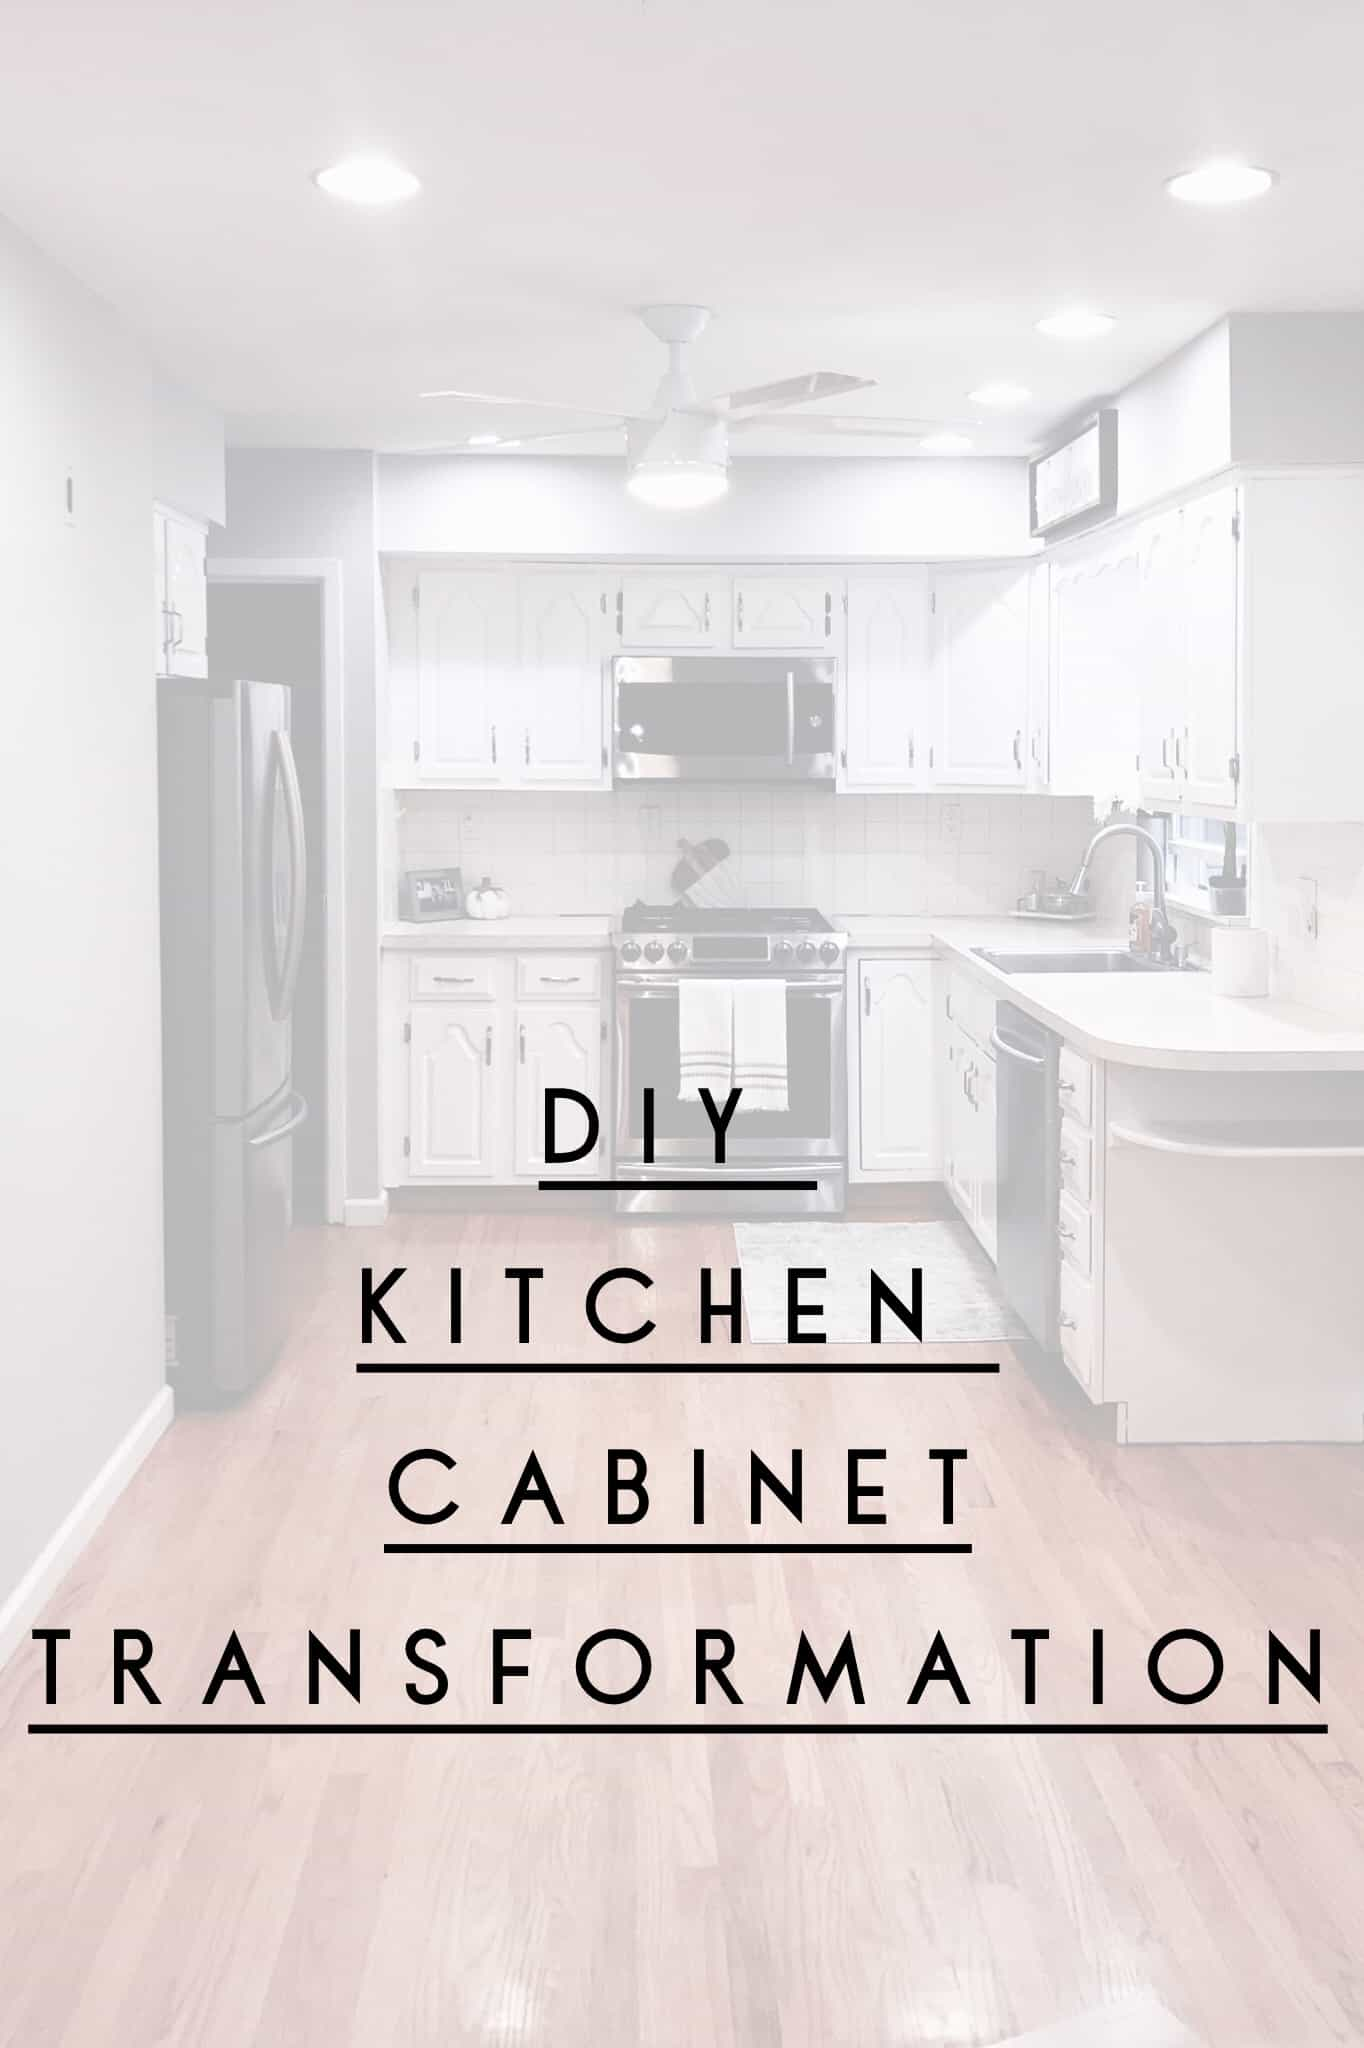 Diy Kitchen Cabinet Transformation A Glass Of Bovino